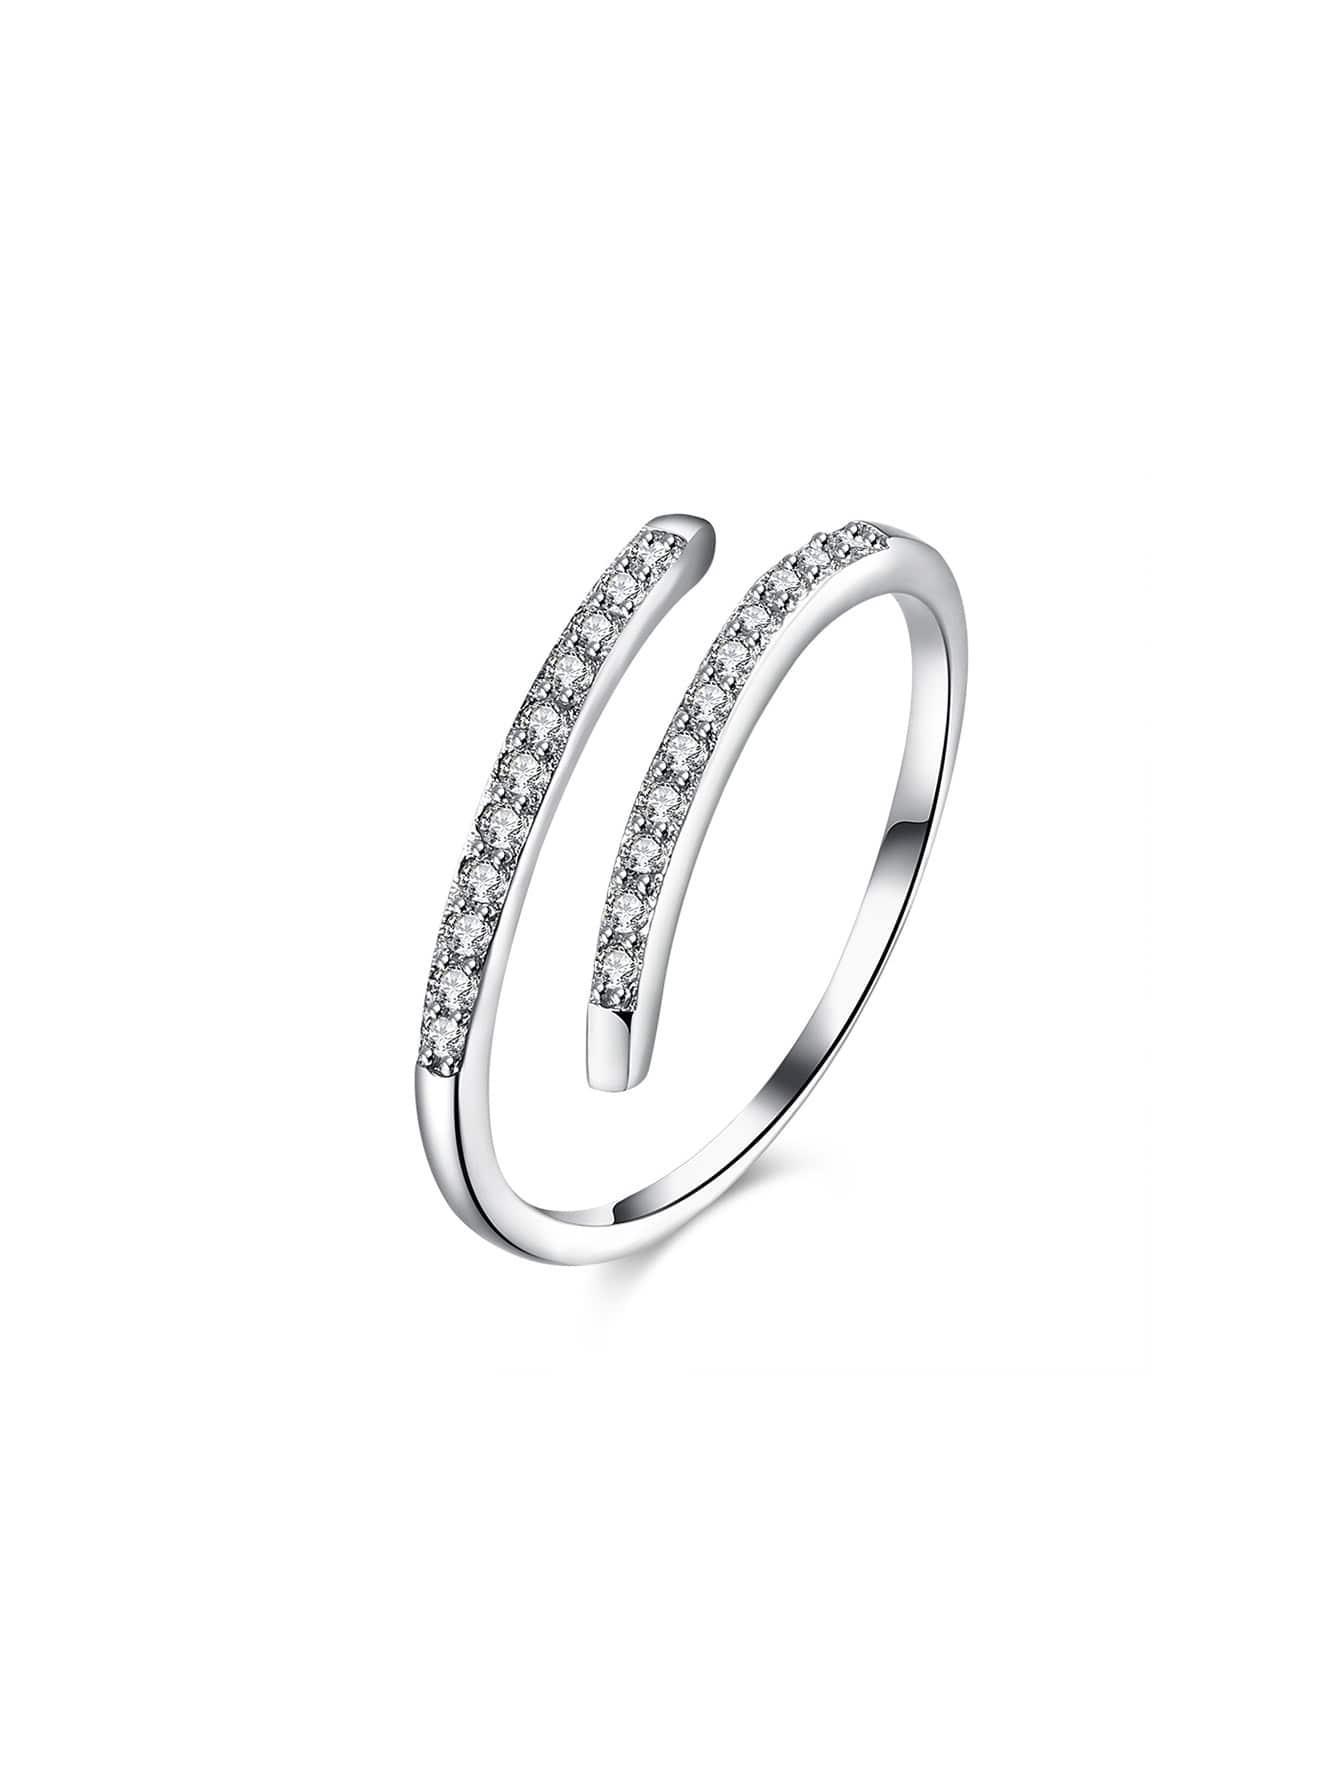 Rhinestone Detail Adjustable Ring